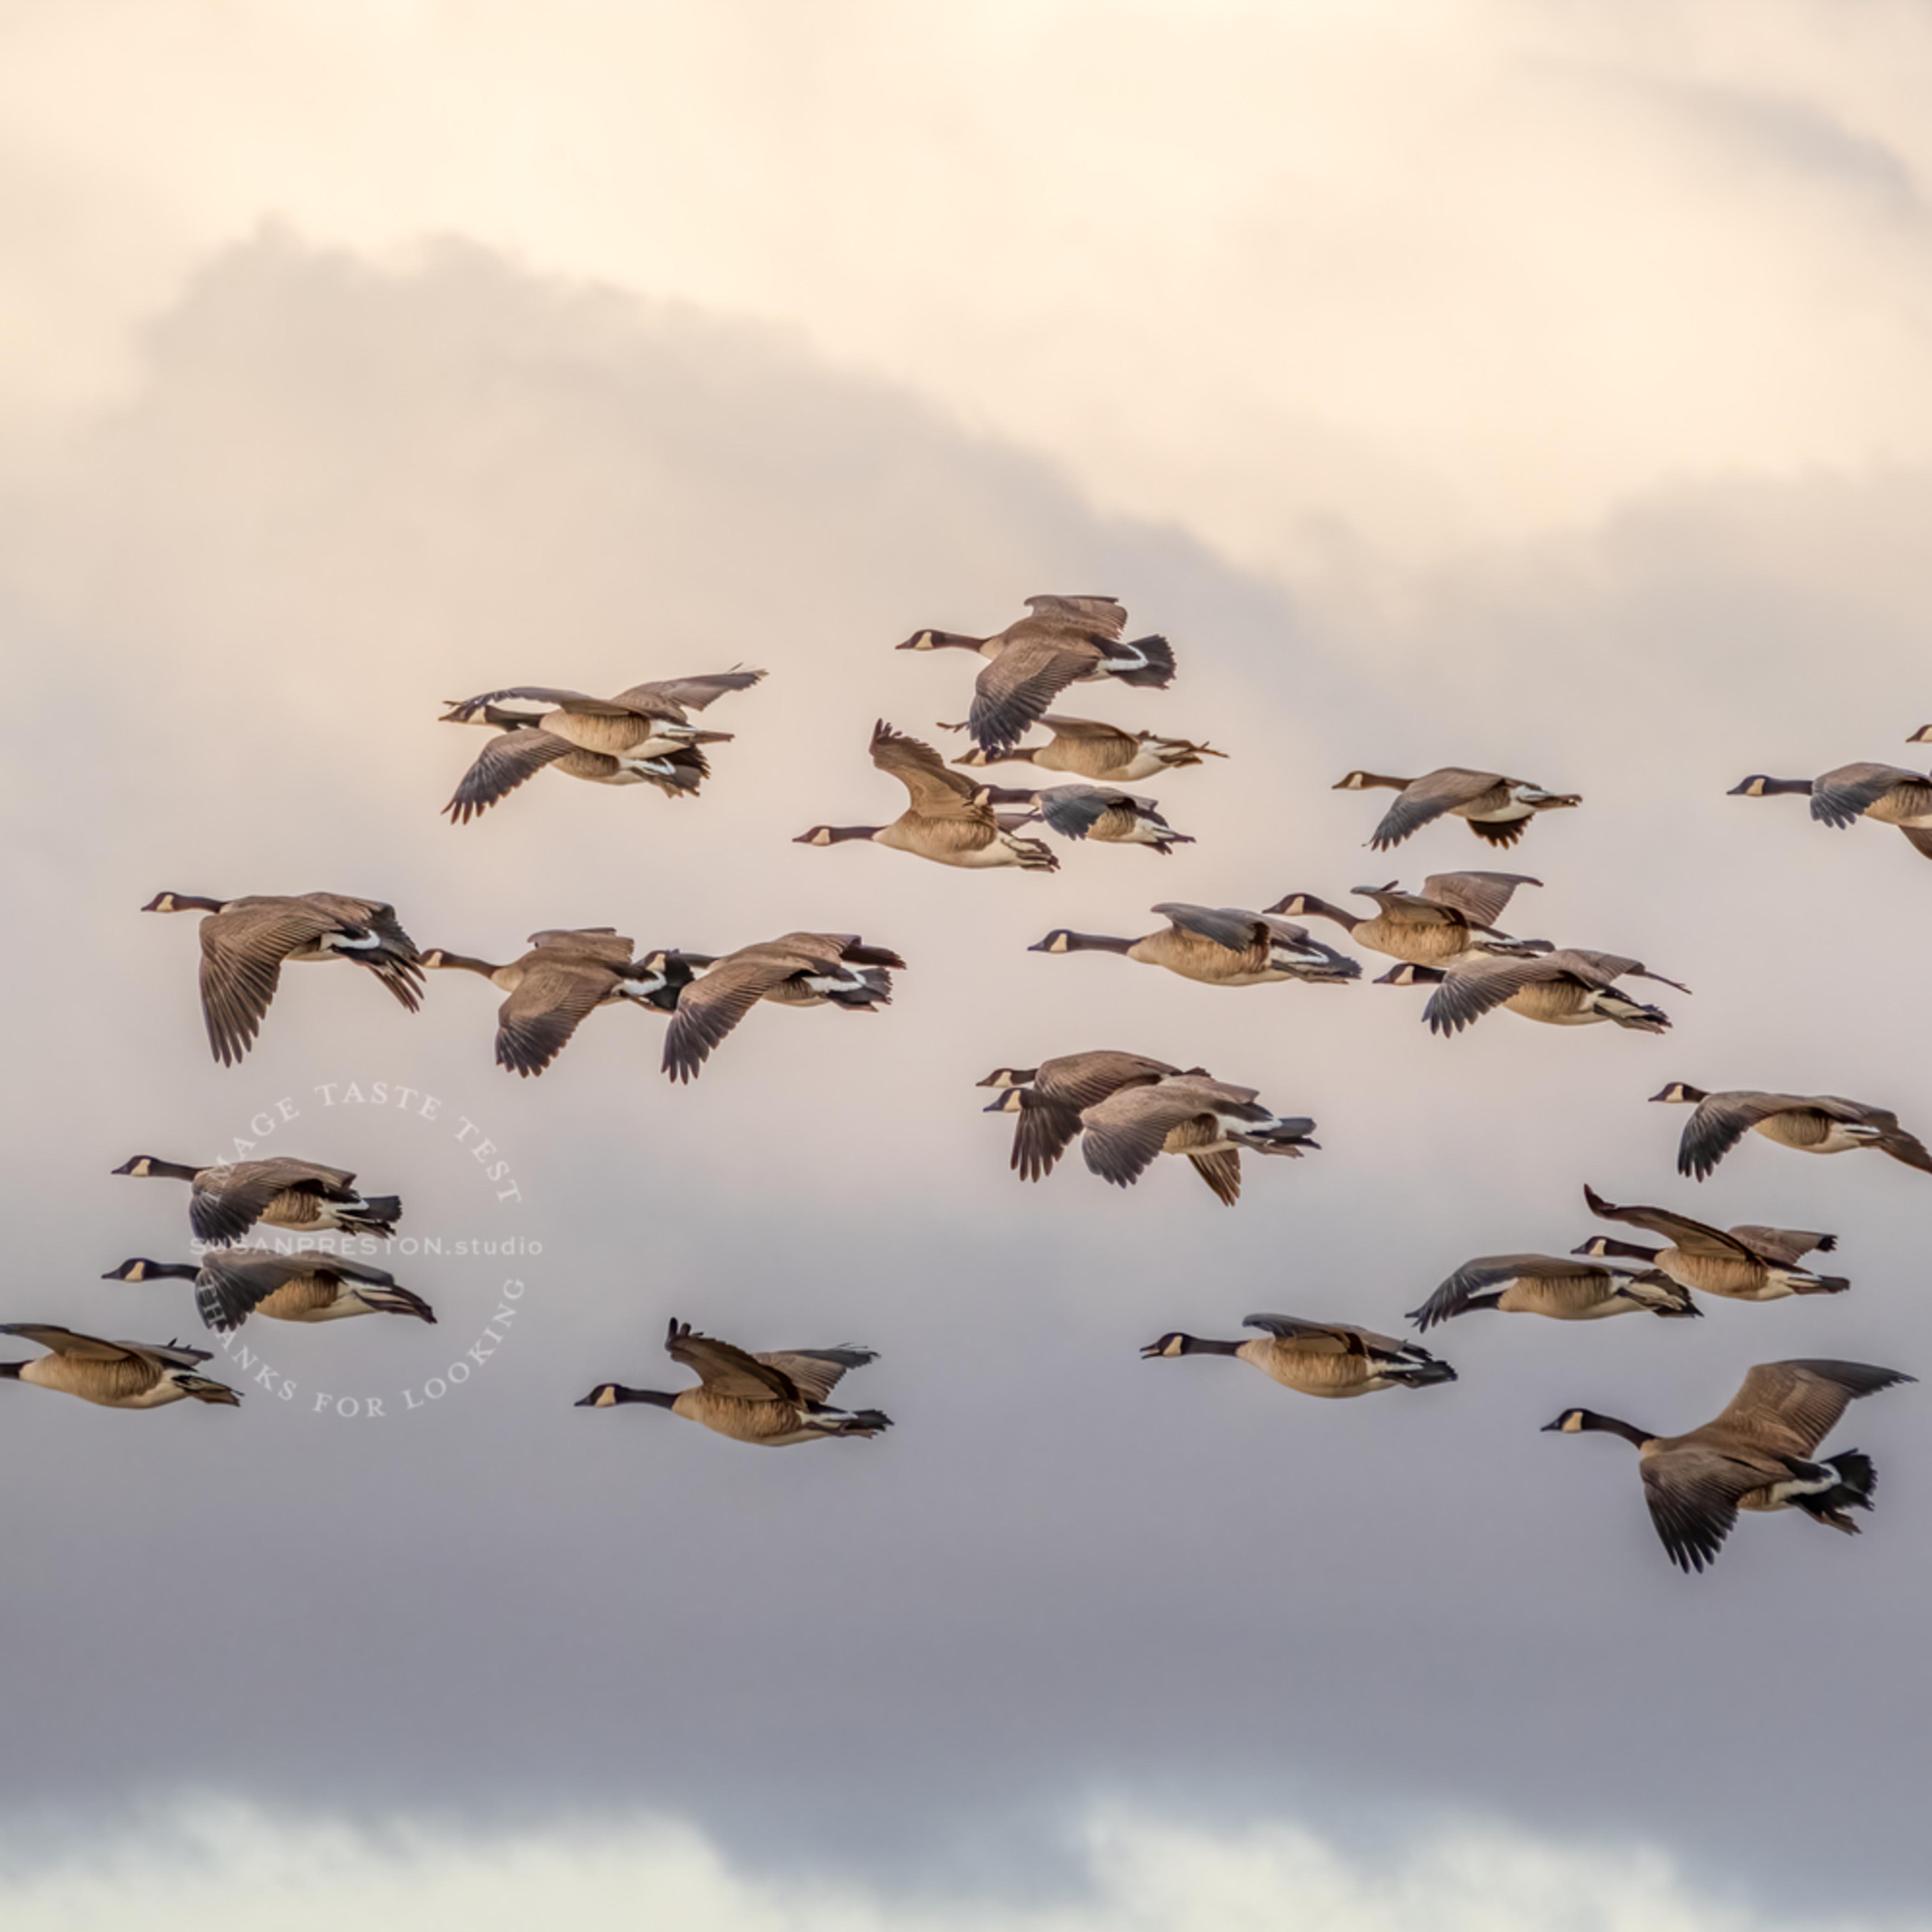 Susan preston candada geese in clouds dscf3180 edit 2 t9vq9m